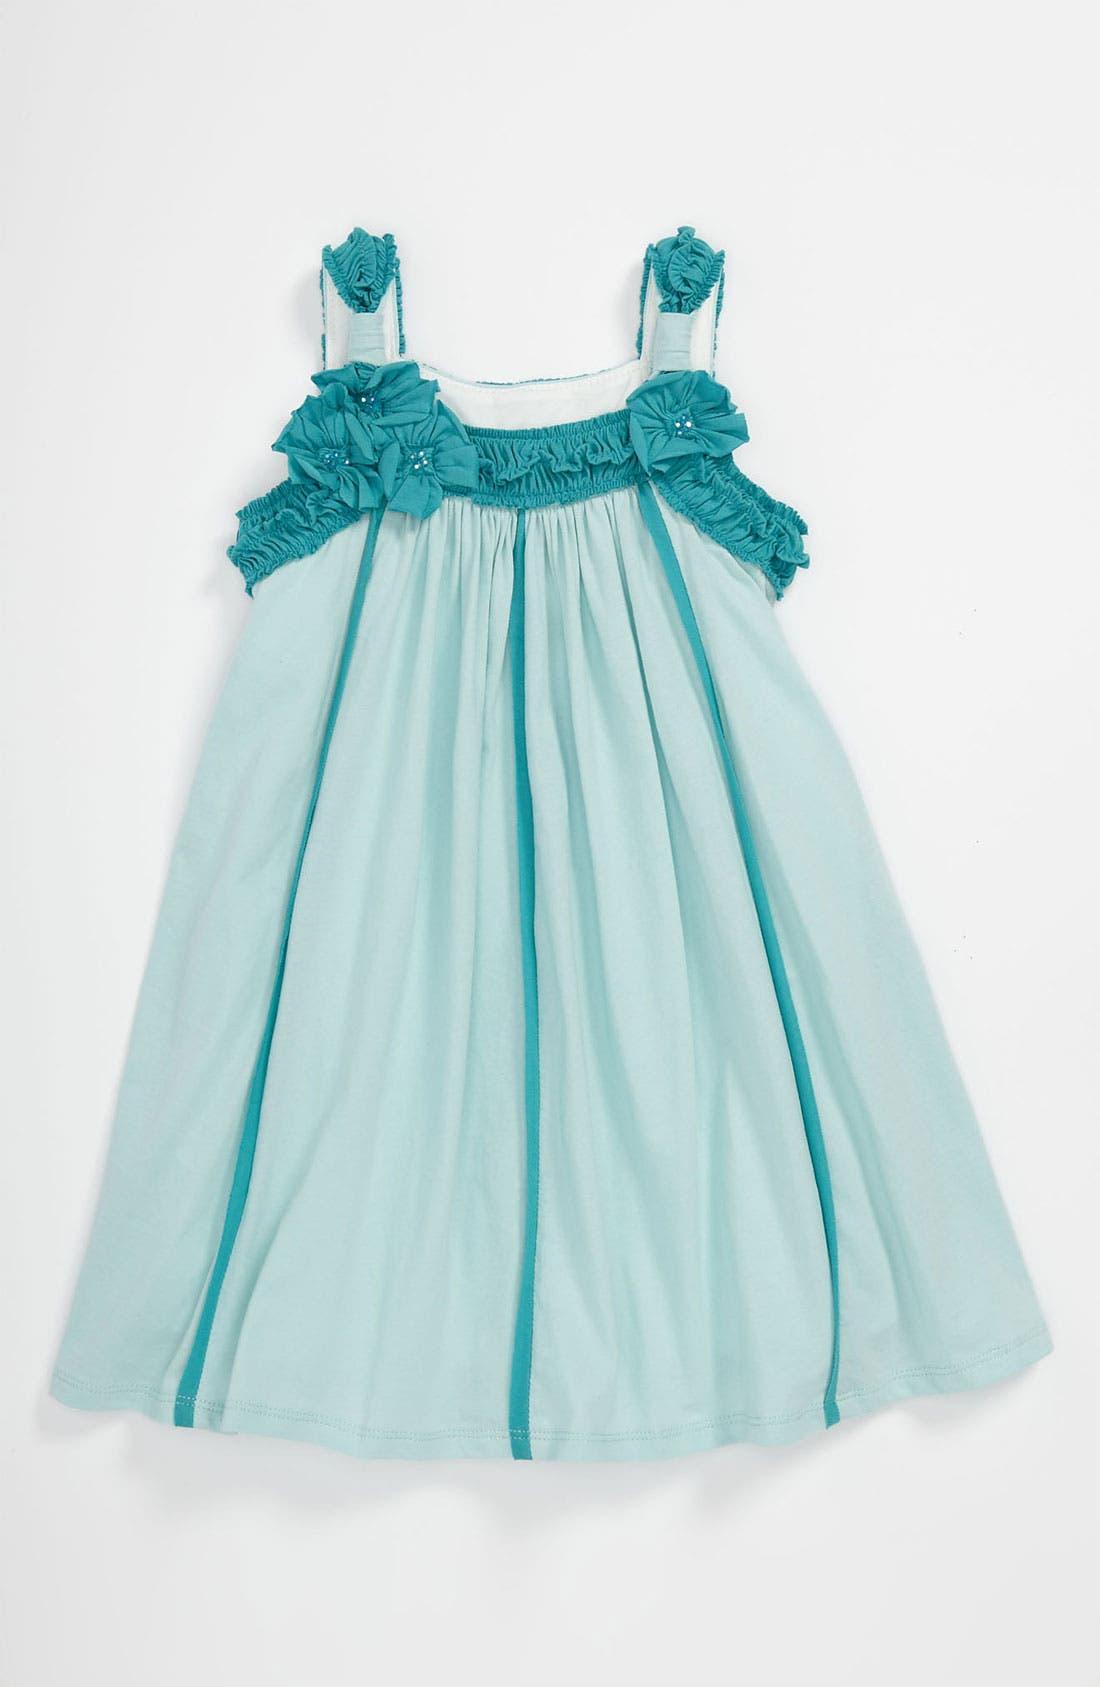 Alternate Image 1 Selected - Isobella & Chloe 'Sophia' Dress (Toddler)